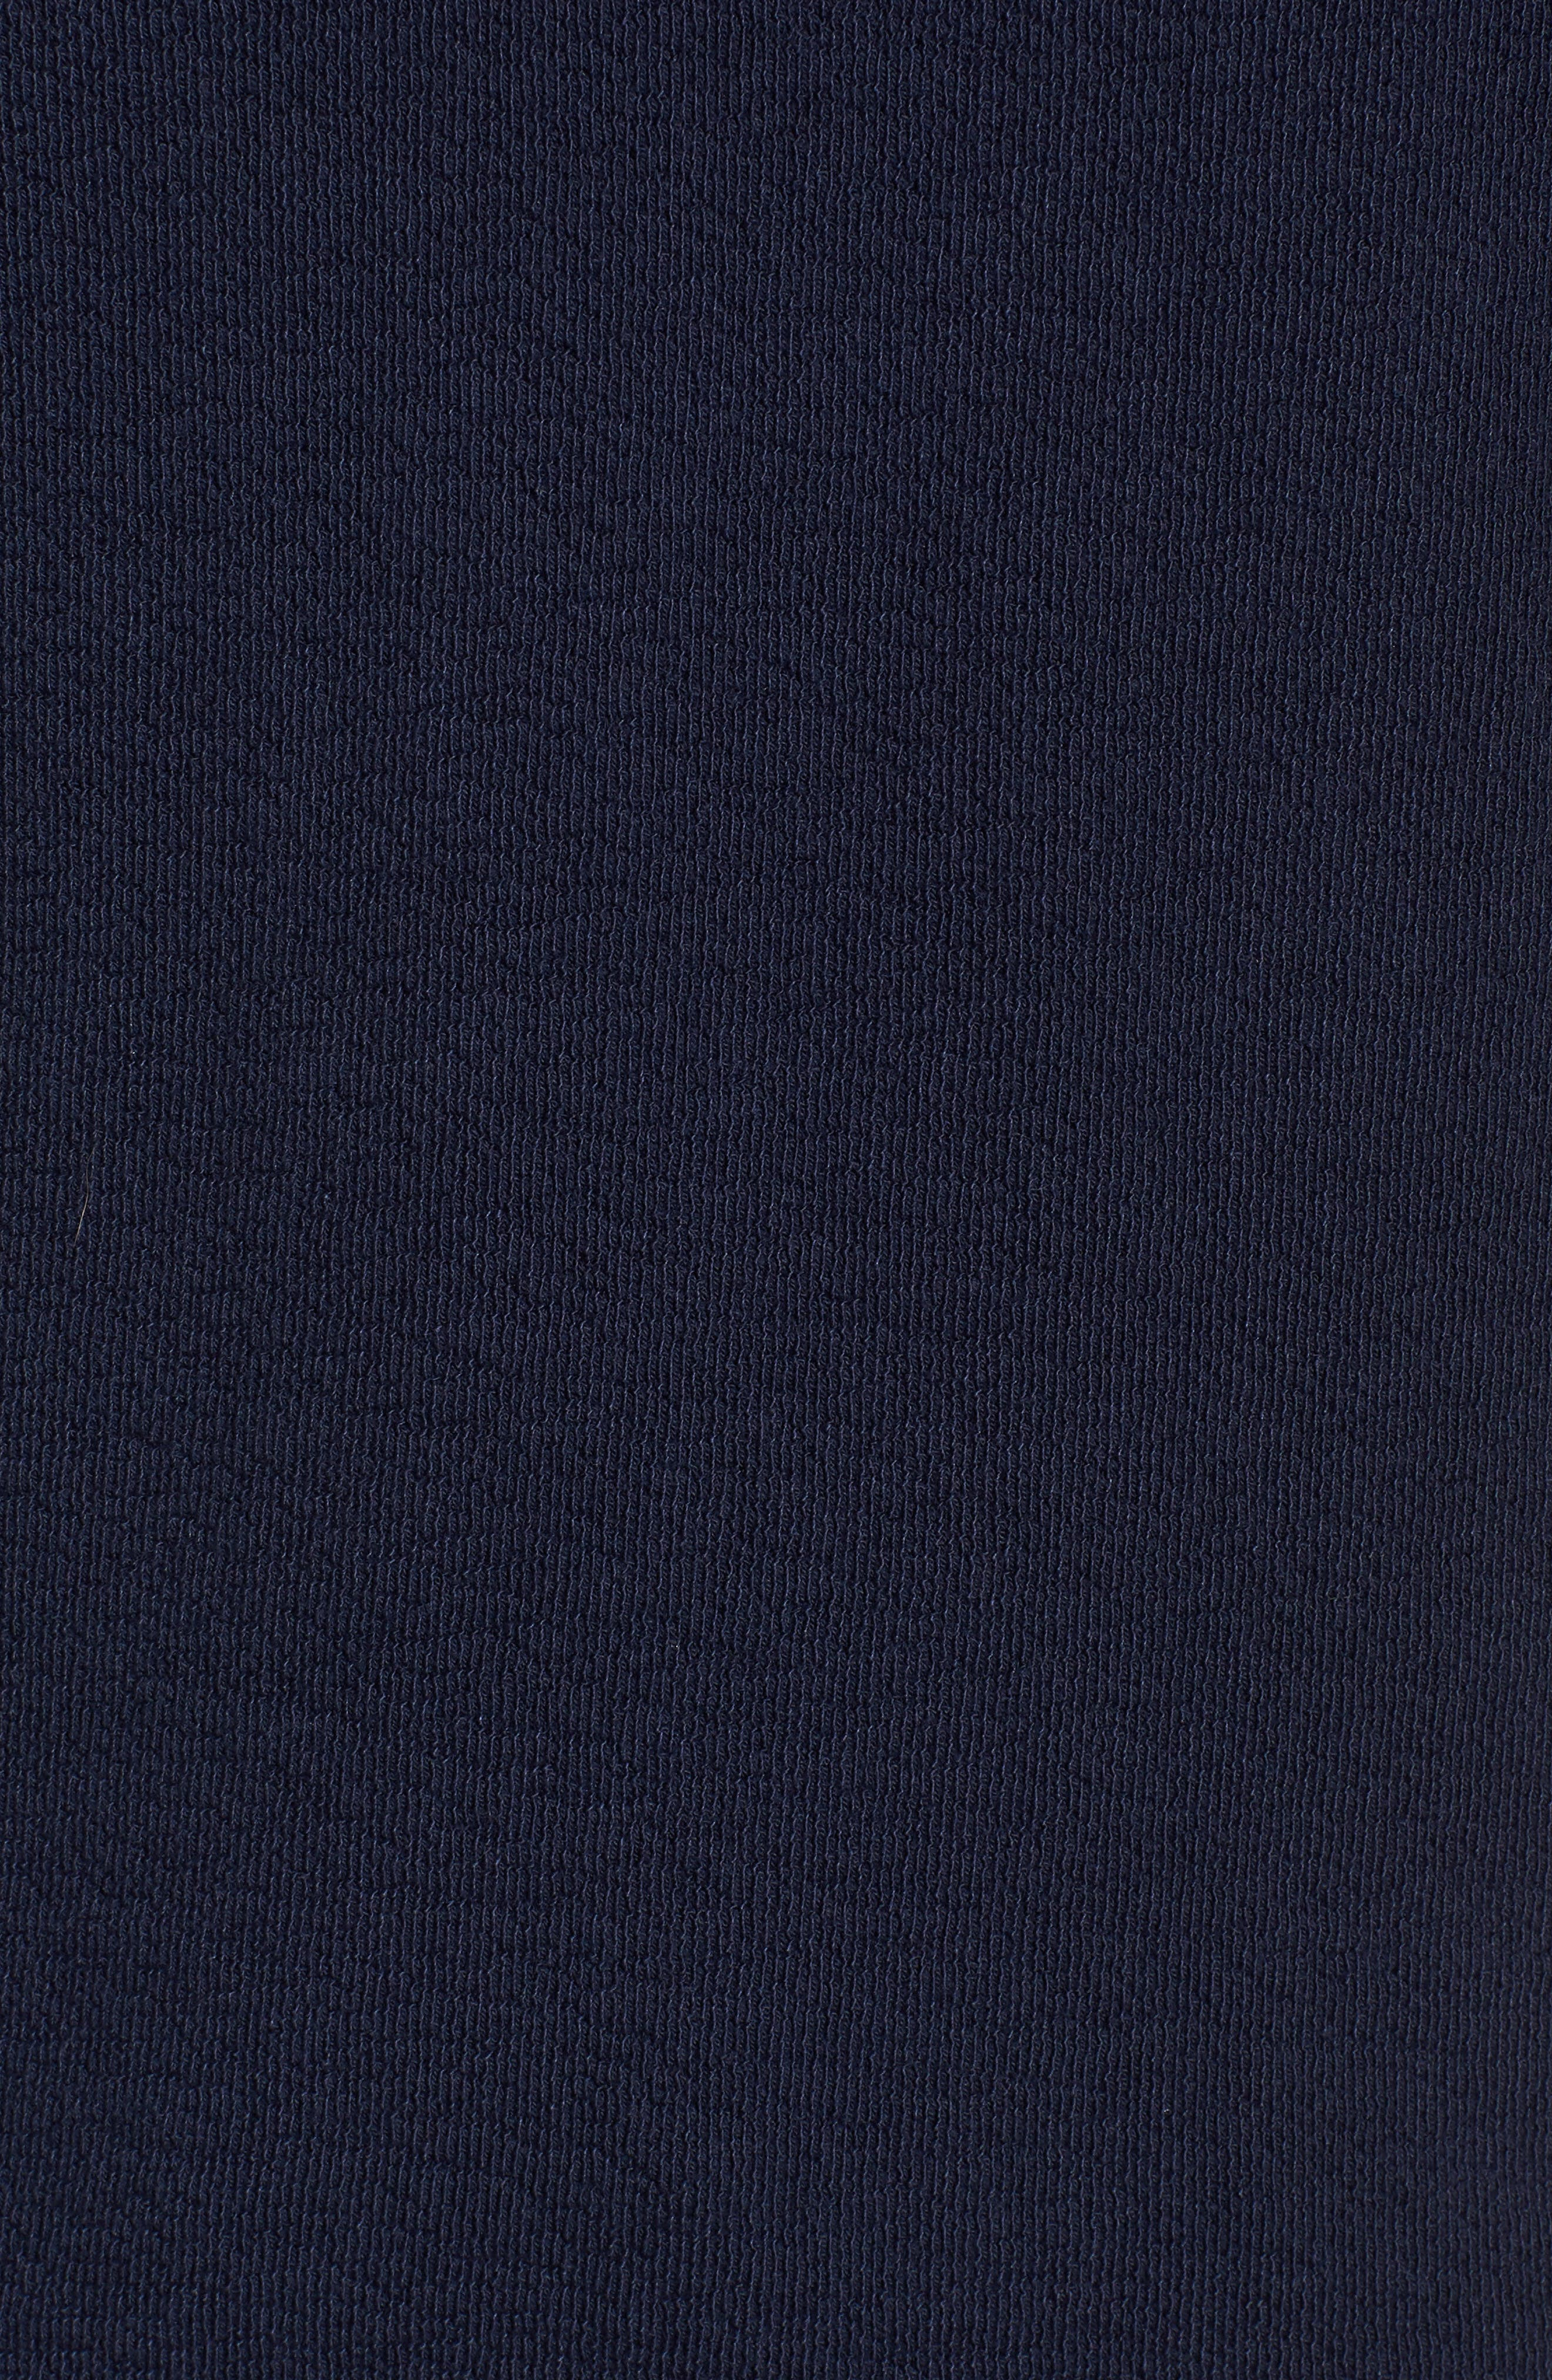 Canyon Long Sleeve Henley T-Shirt,                             Alternate thumbnail 5, color,                             410